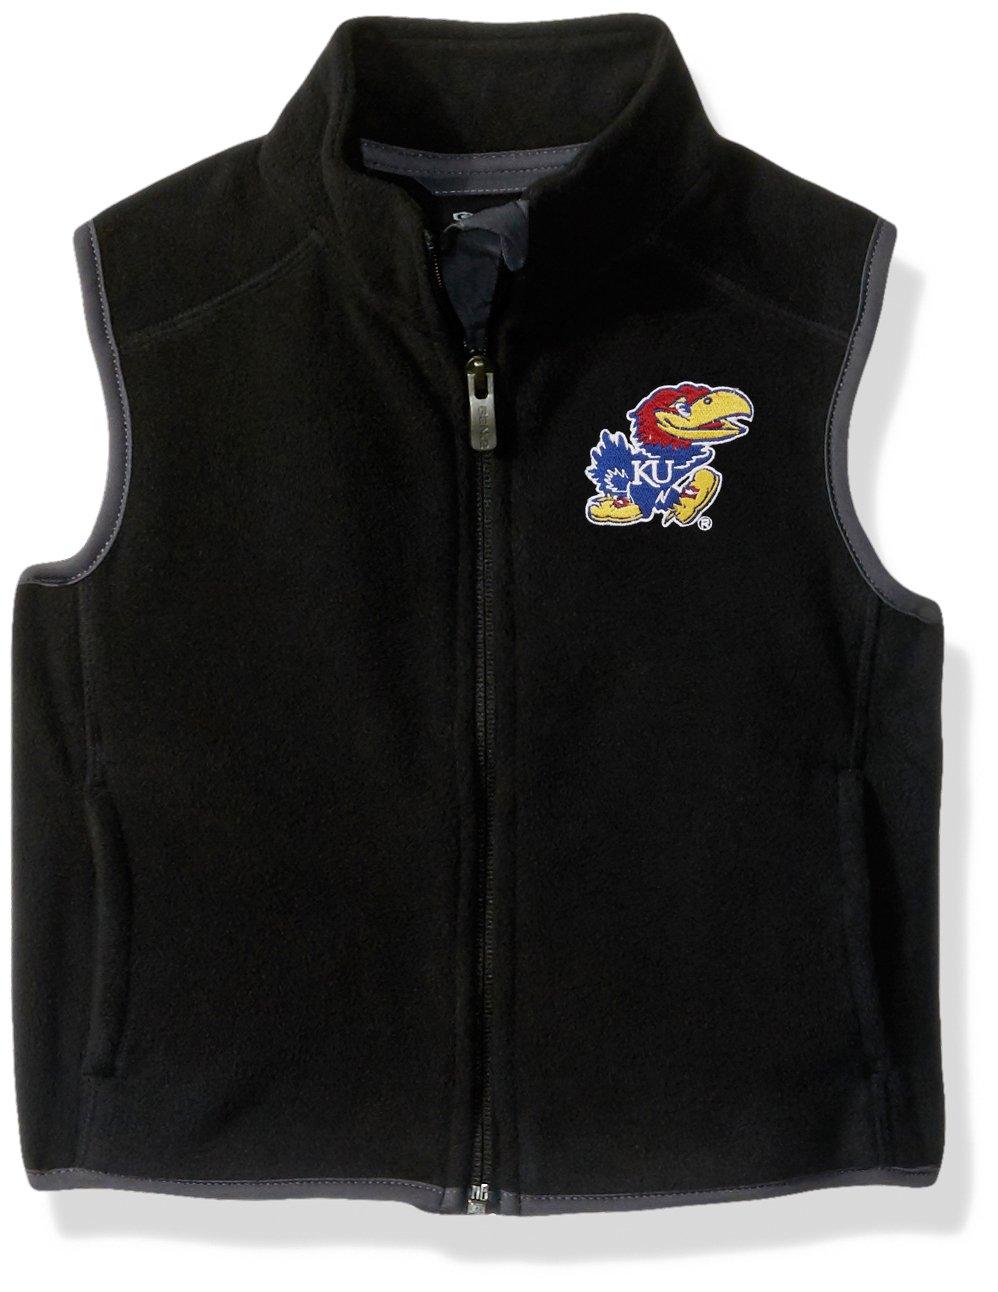 NCAA Boys Scrimmage Fleece Vest 468YK-P